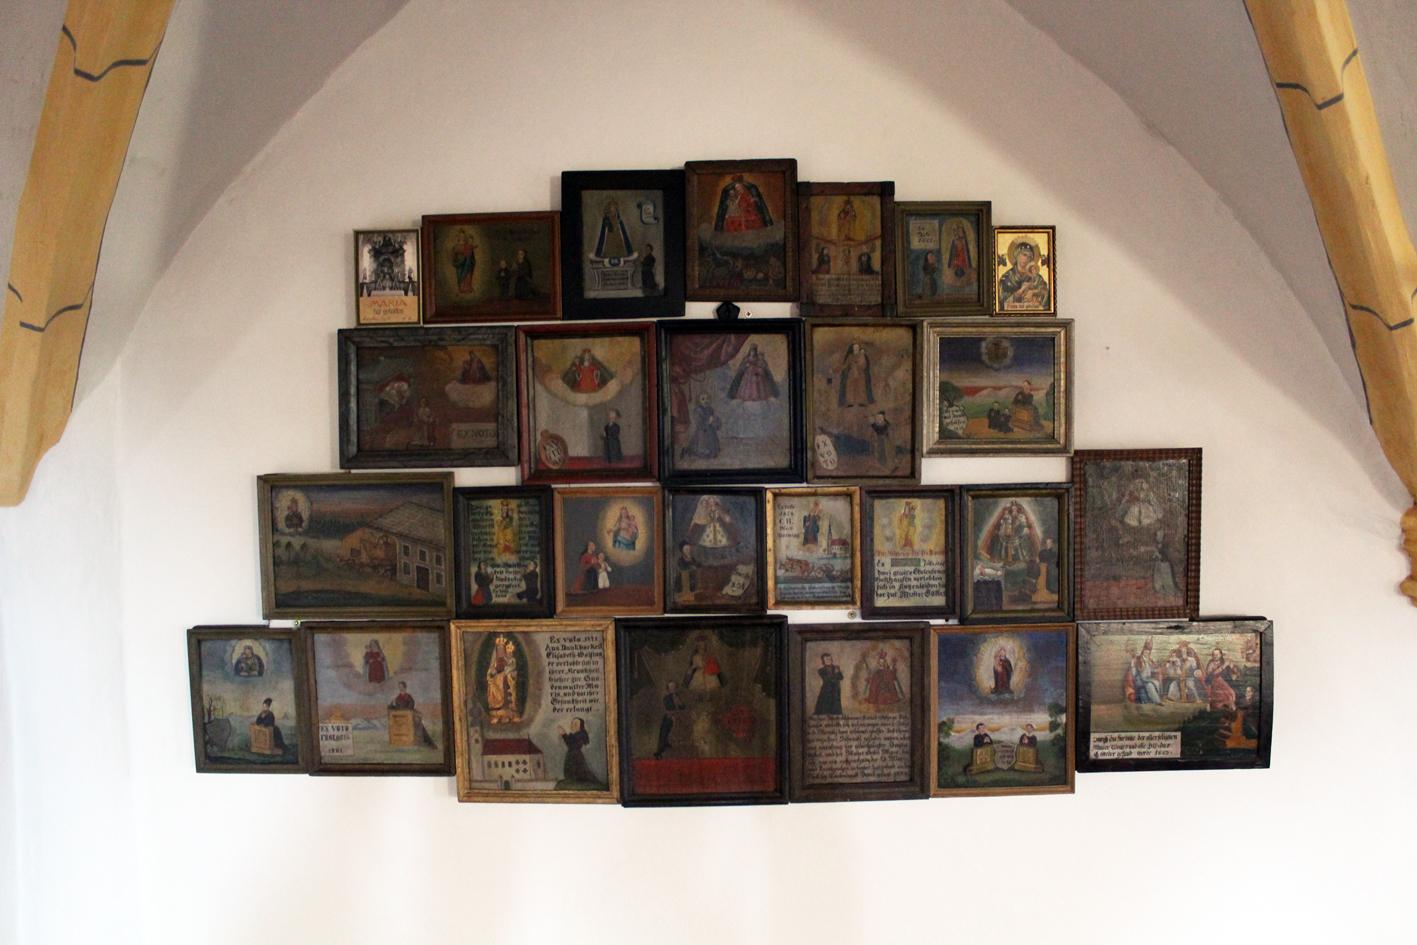 2021 05 17 aoelfb niedergottsau kirche mariae himmelfahrt votivtafeln